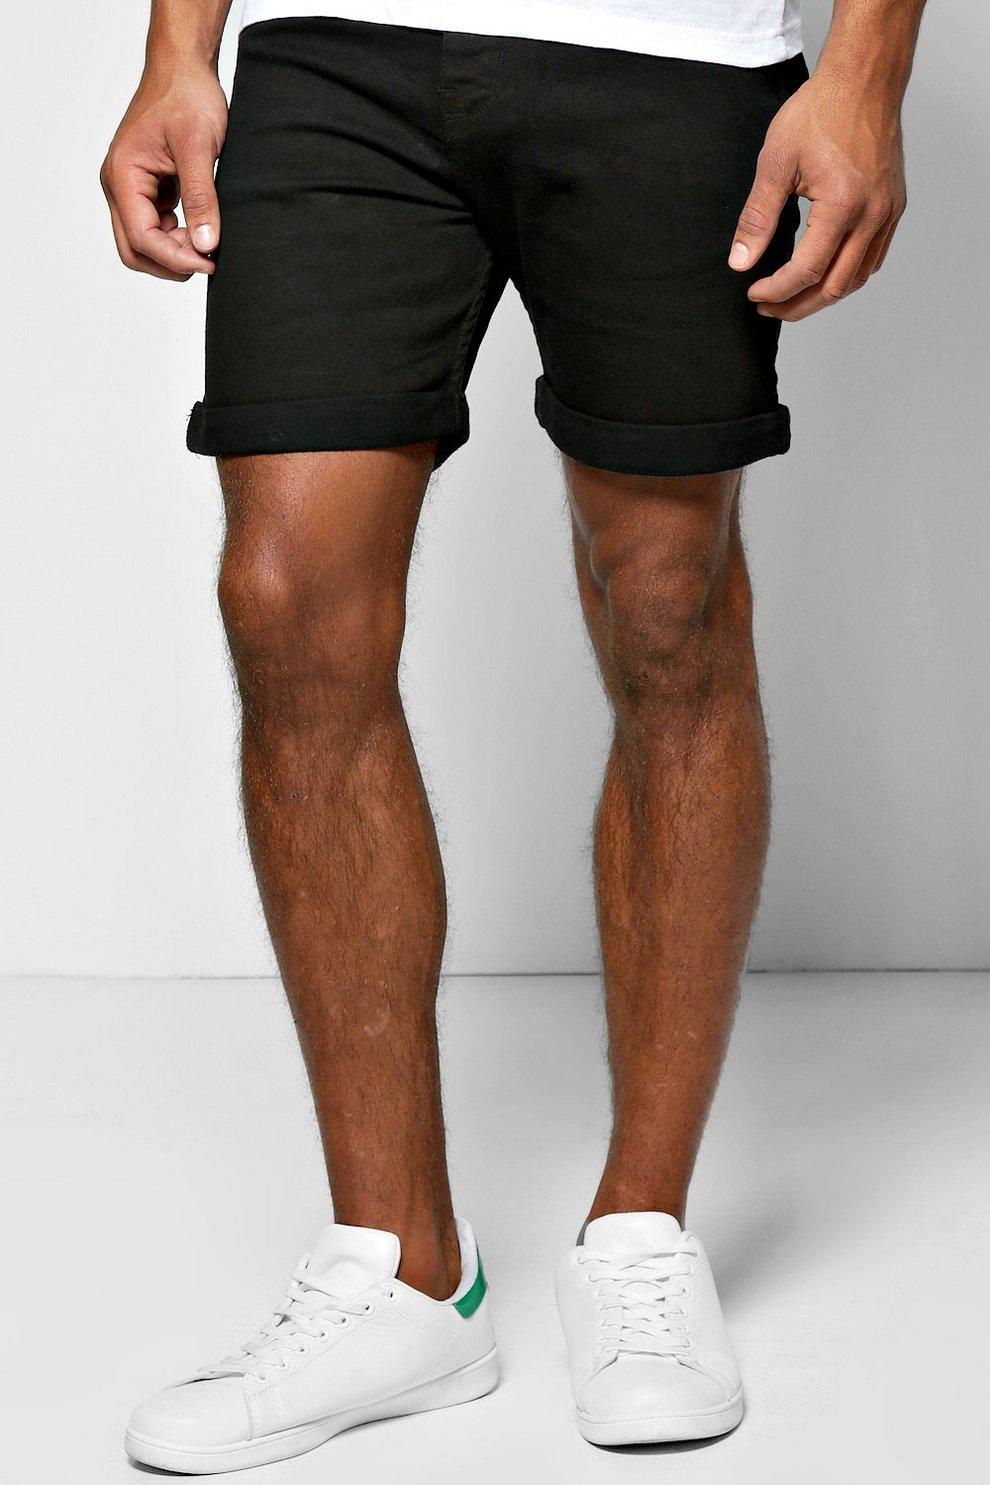 73e65da03d95 Skinny Fit Black Denim Shorts in Mid Length | Boohoo